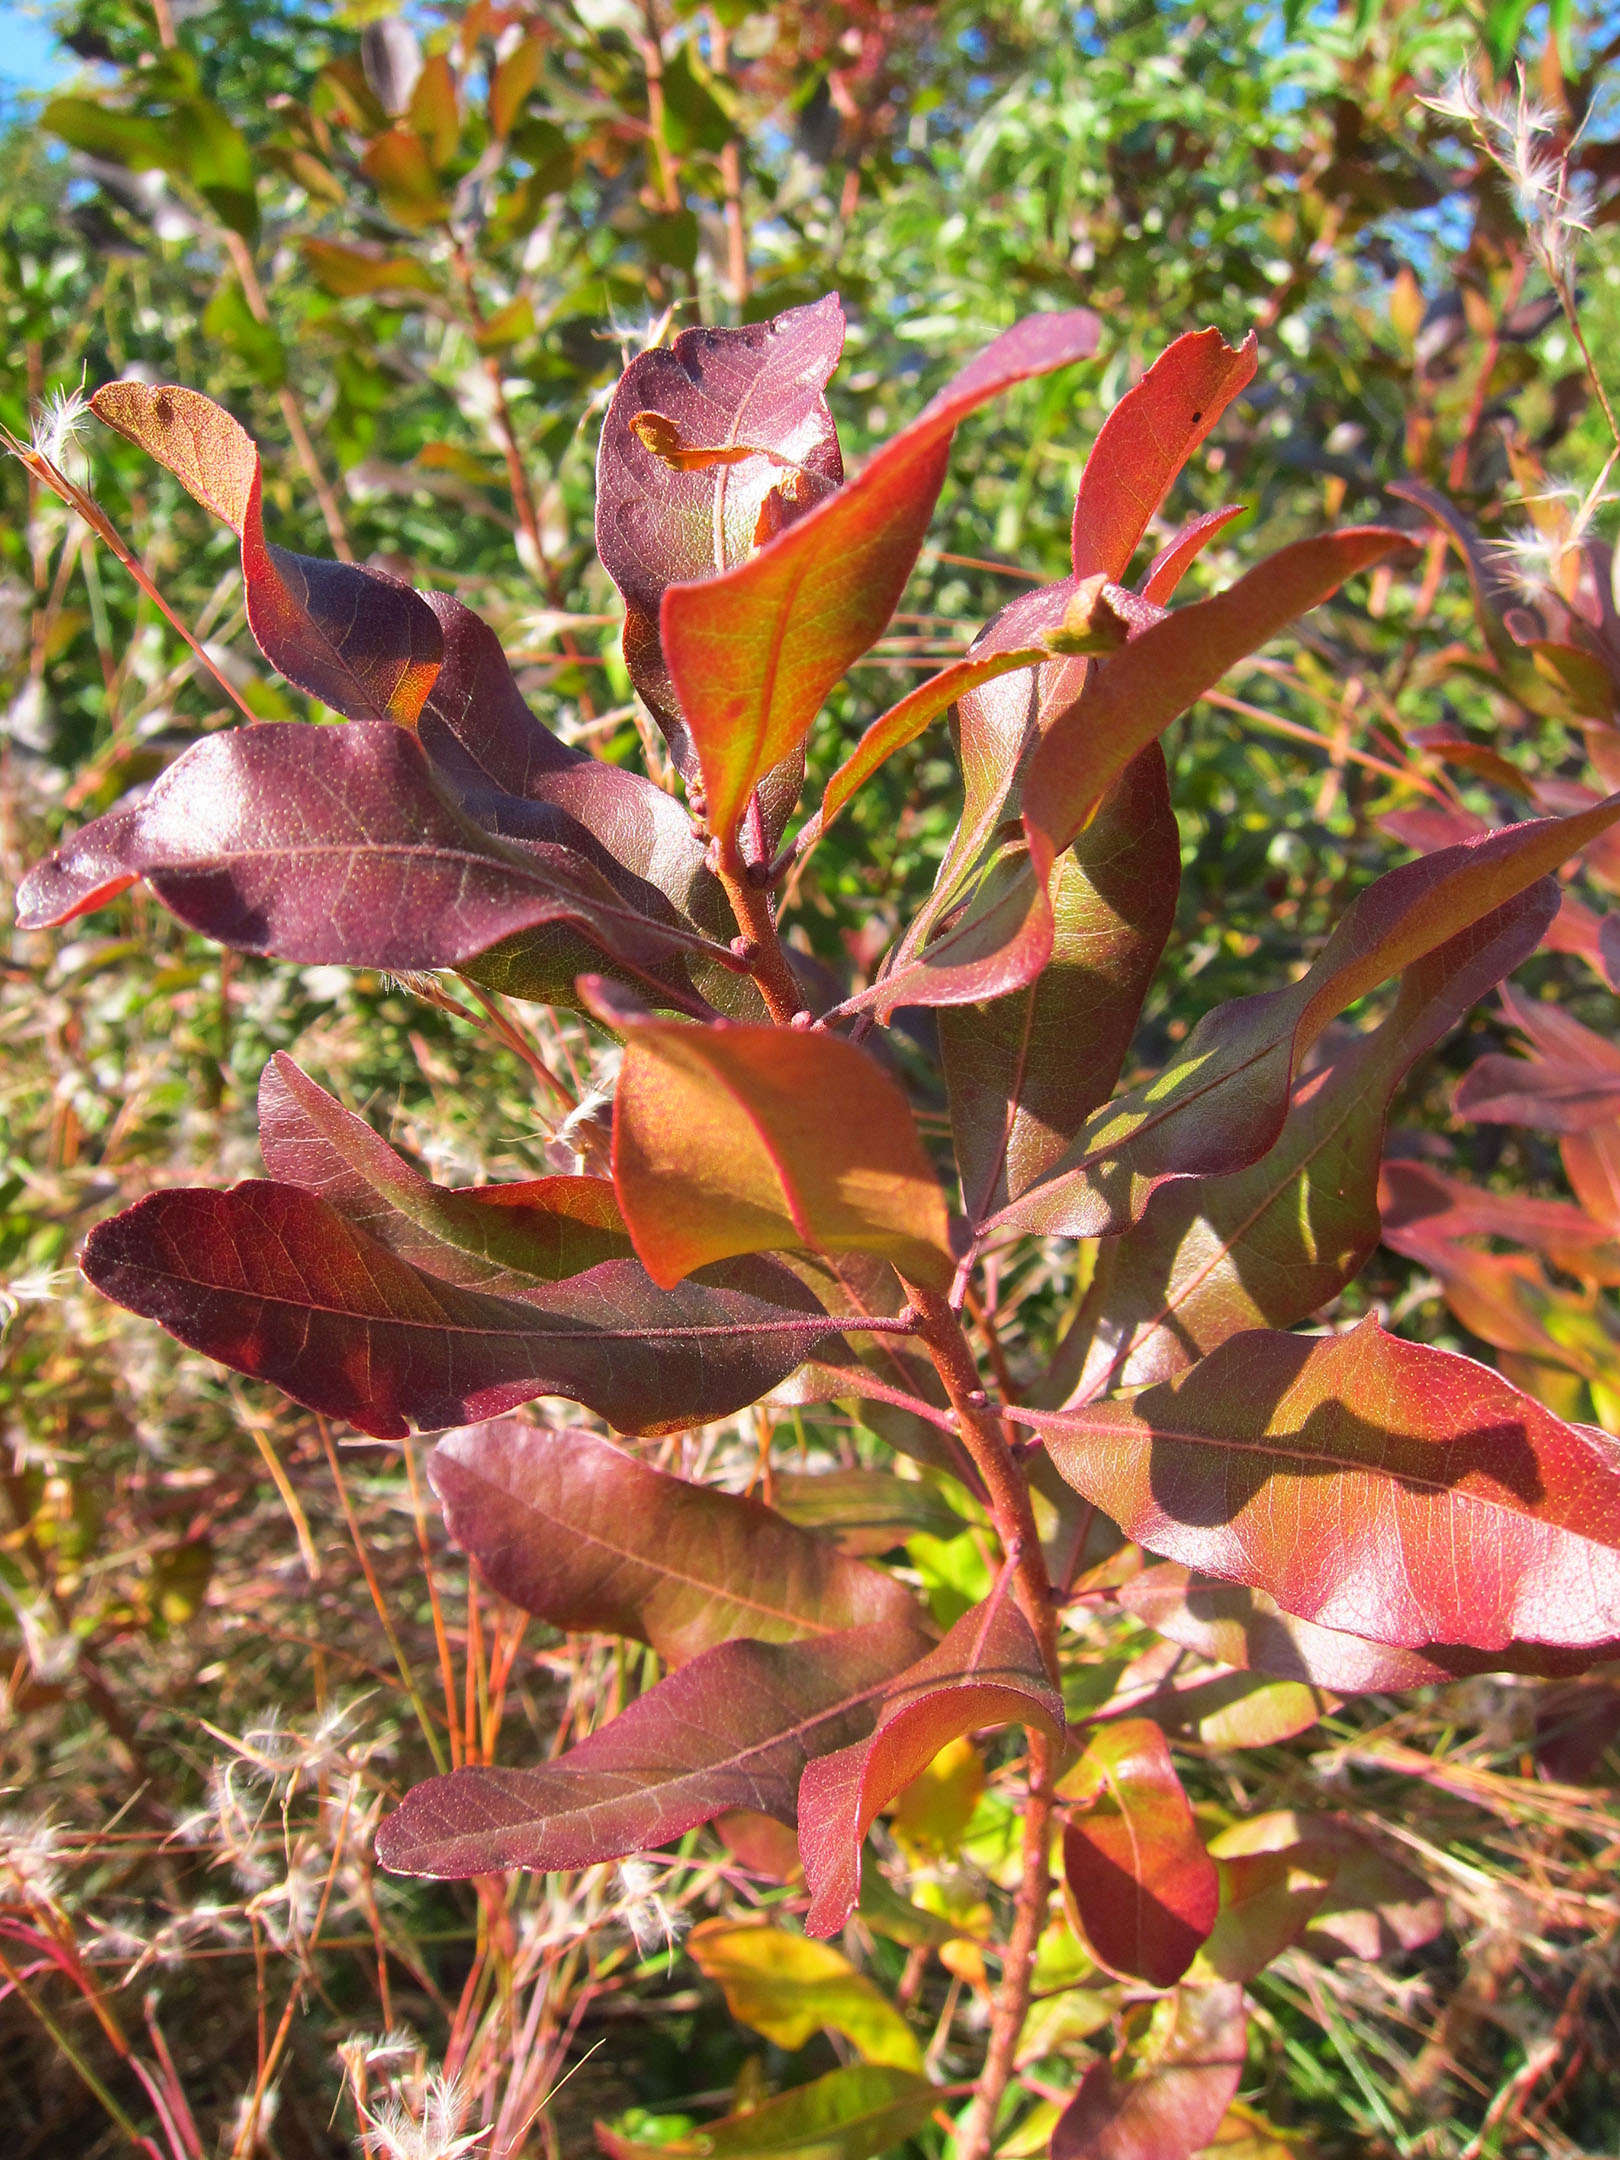 shrubs-colorful-fall-foliage-marie-viljoen-gardenista-bayberry